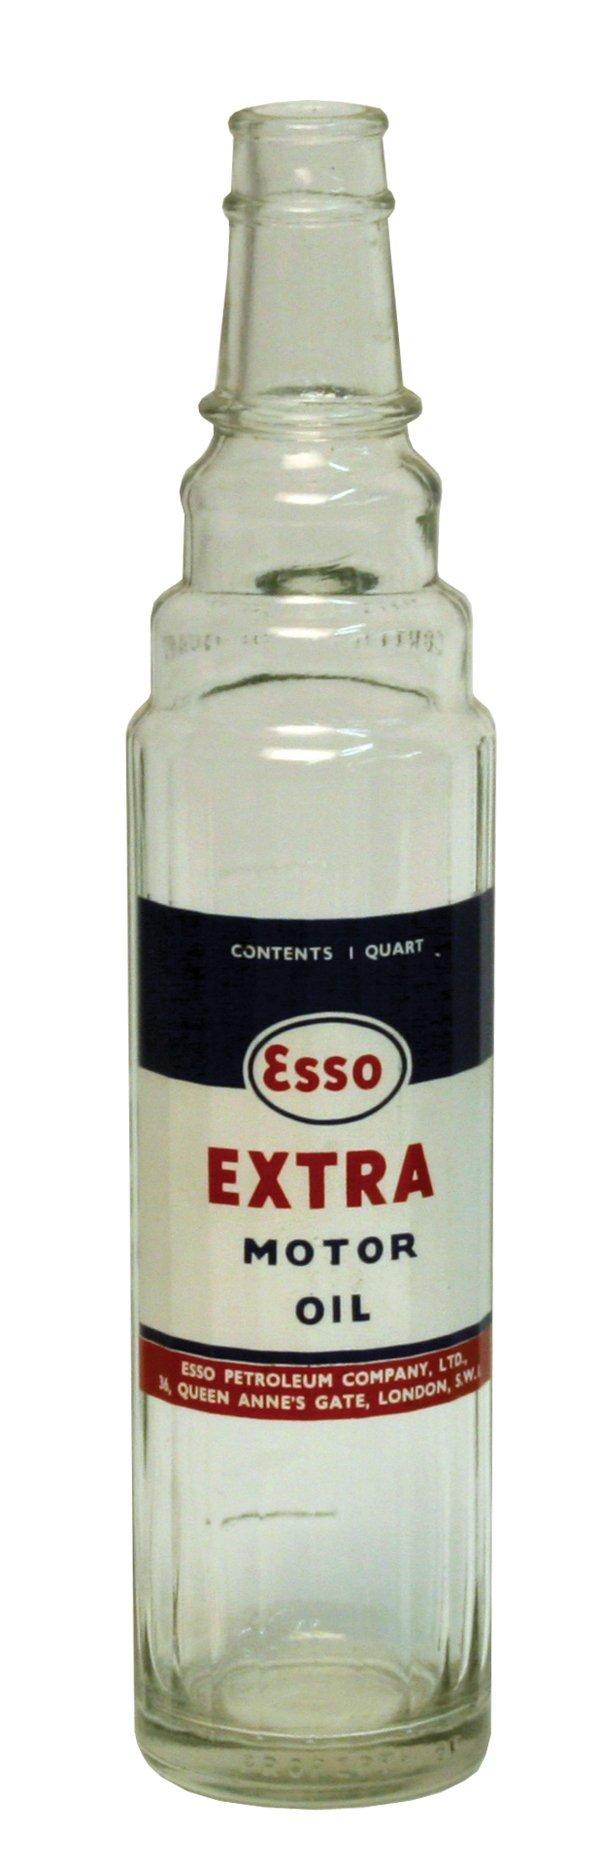 221: Esso One-Quart Glass Motor Oil Container.